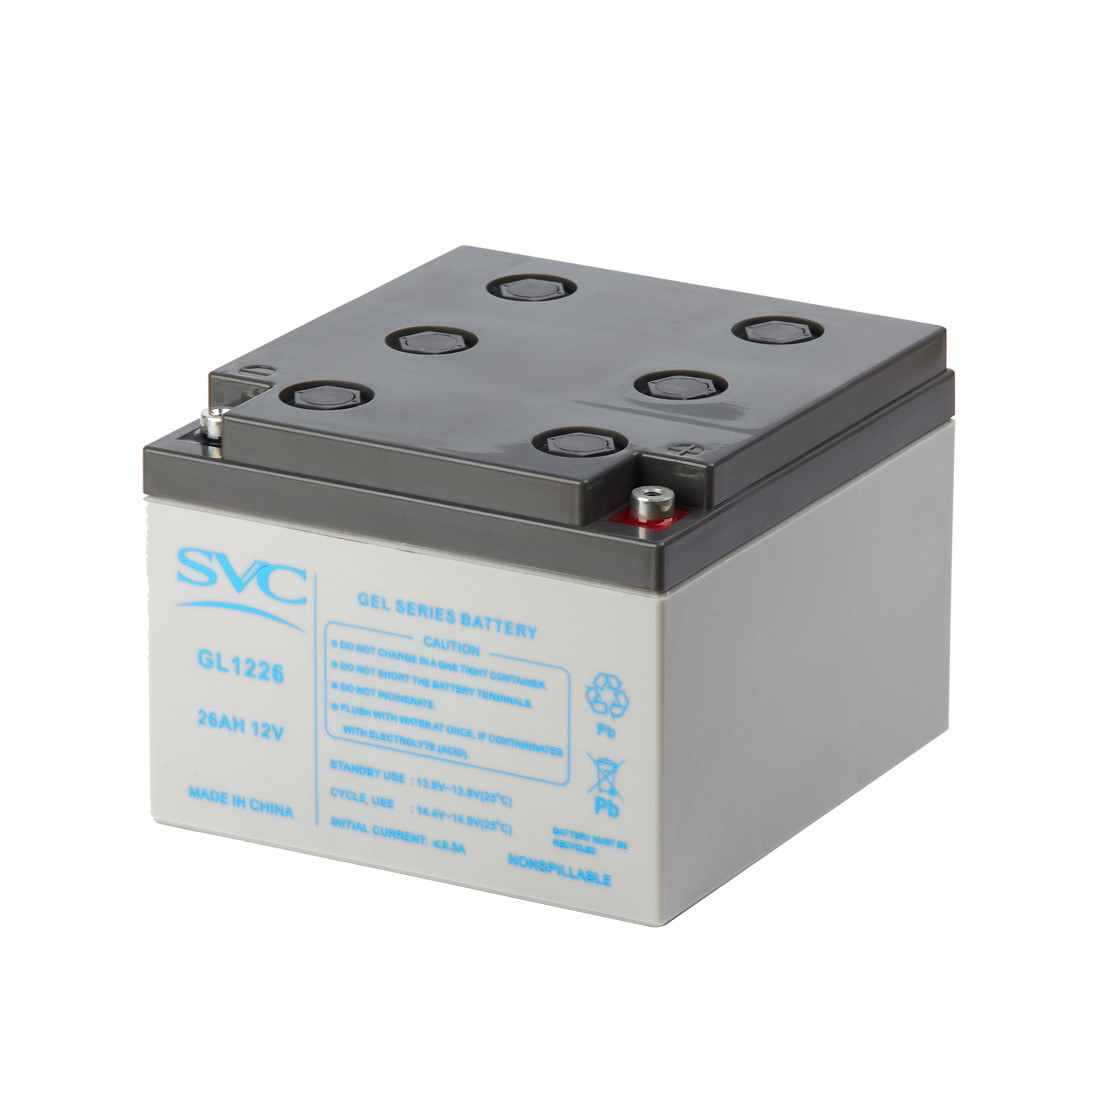 Батарея гелевая SVC GL1226 (12В, 26 Ач)